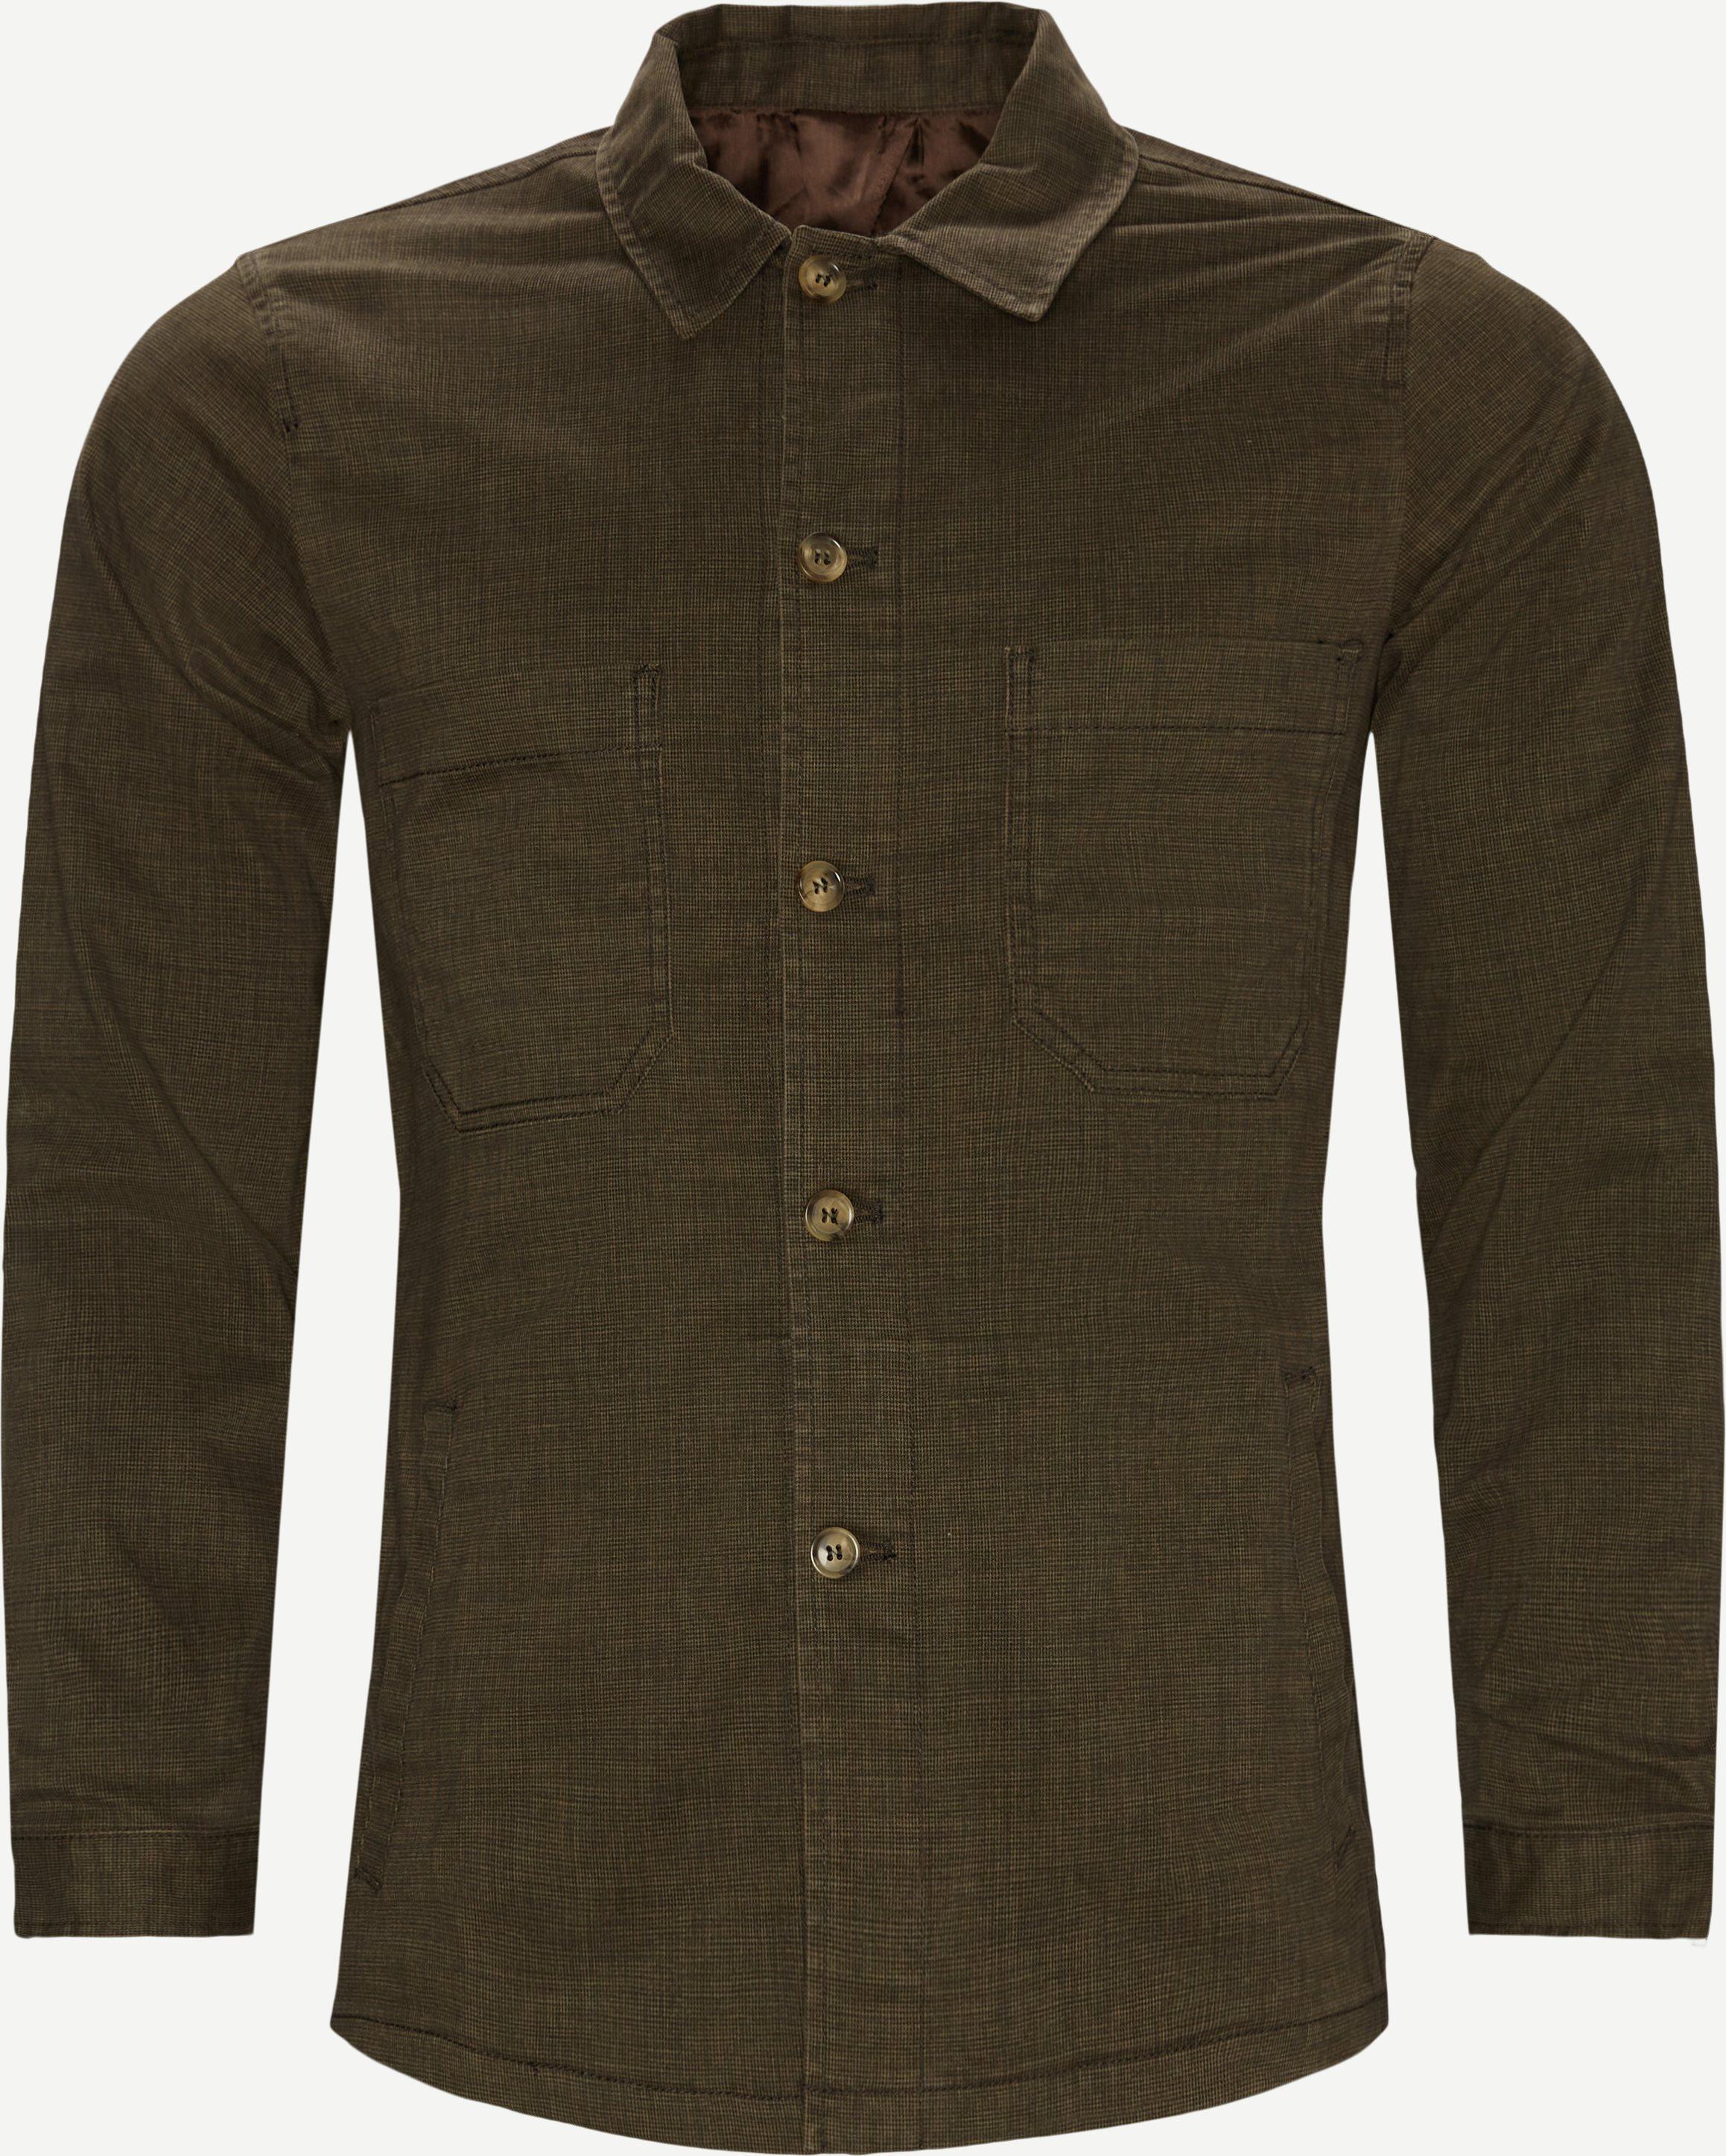 0766 Andy Overshirt - Blazer - Regular fit - Army